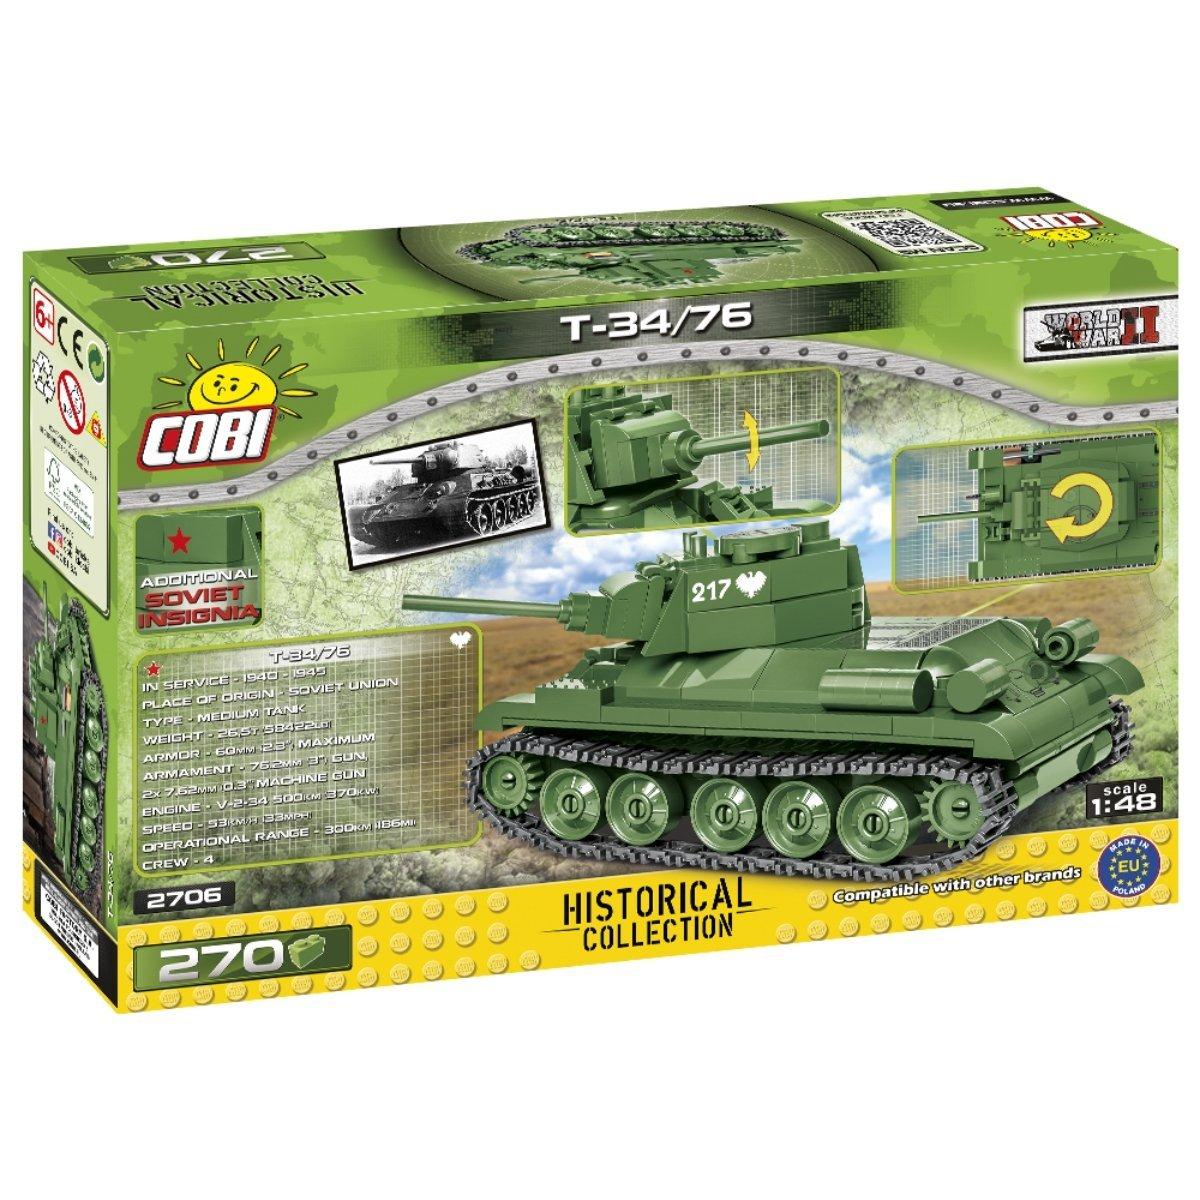 COBI 148 T-34 76 Set (2706) Amazon